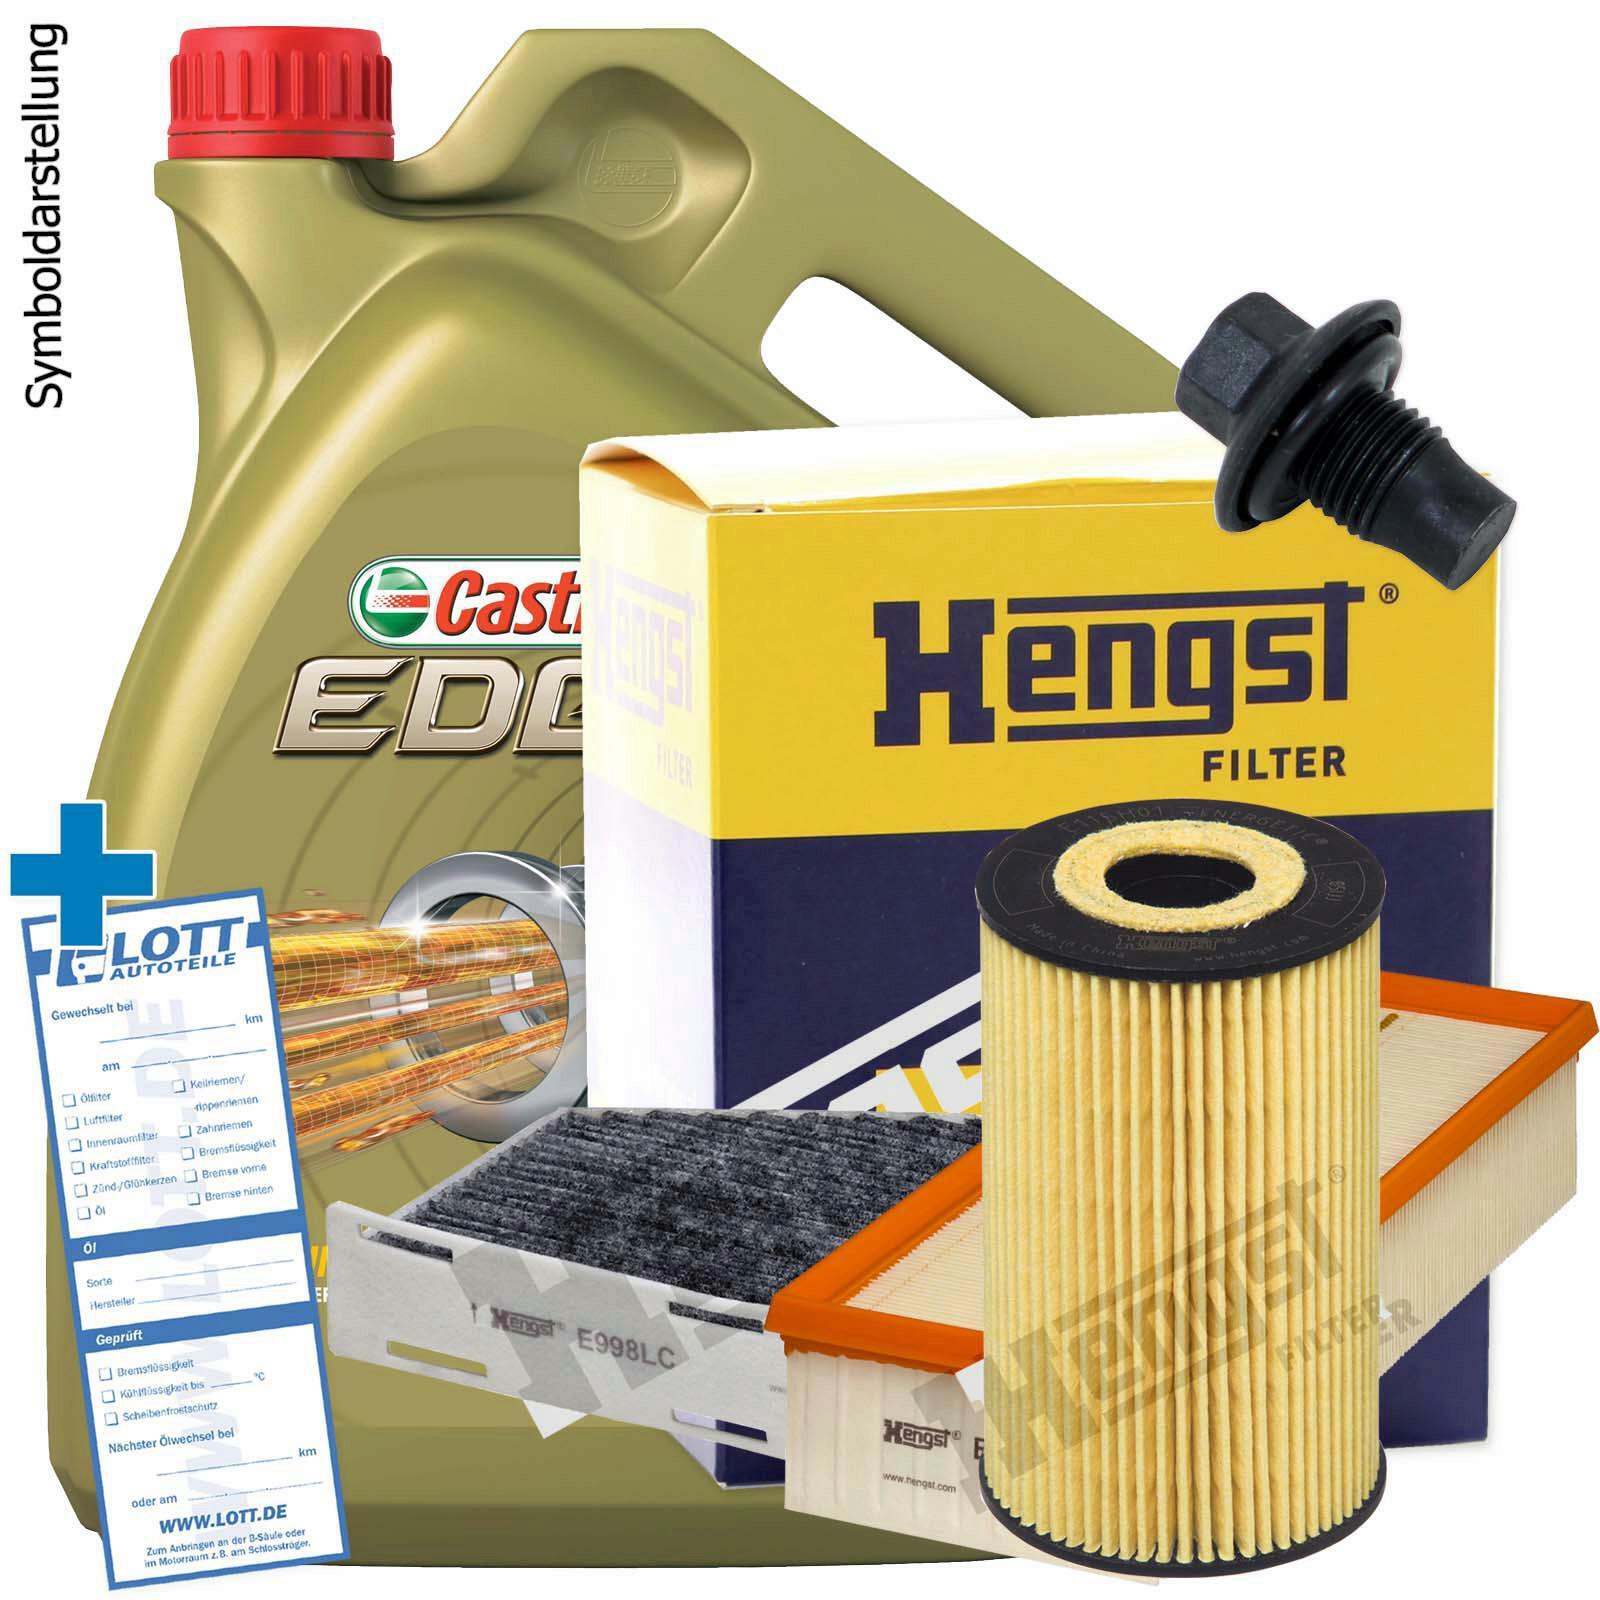 Castrol Motoröl + Ölfilter + Luftfilter + Innenraumfilter + Ablassschraube